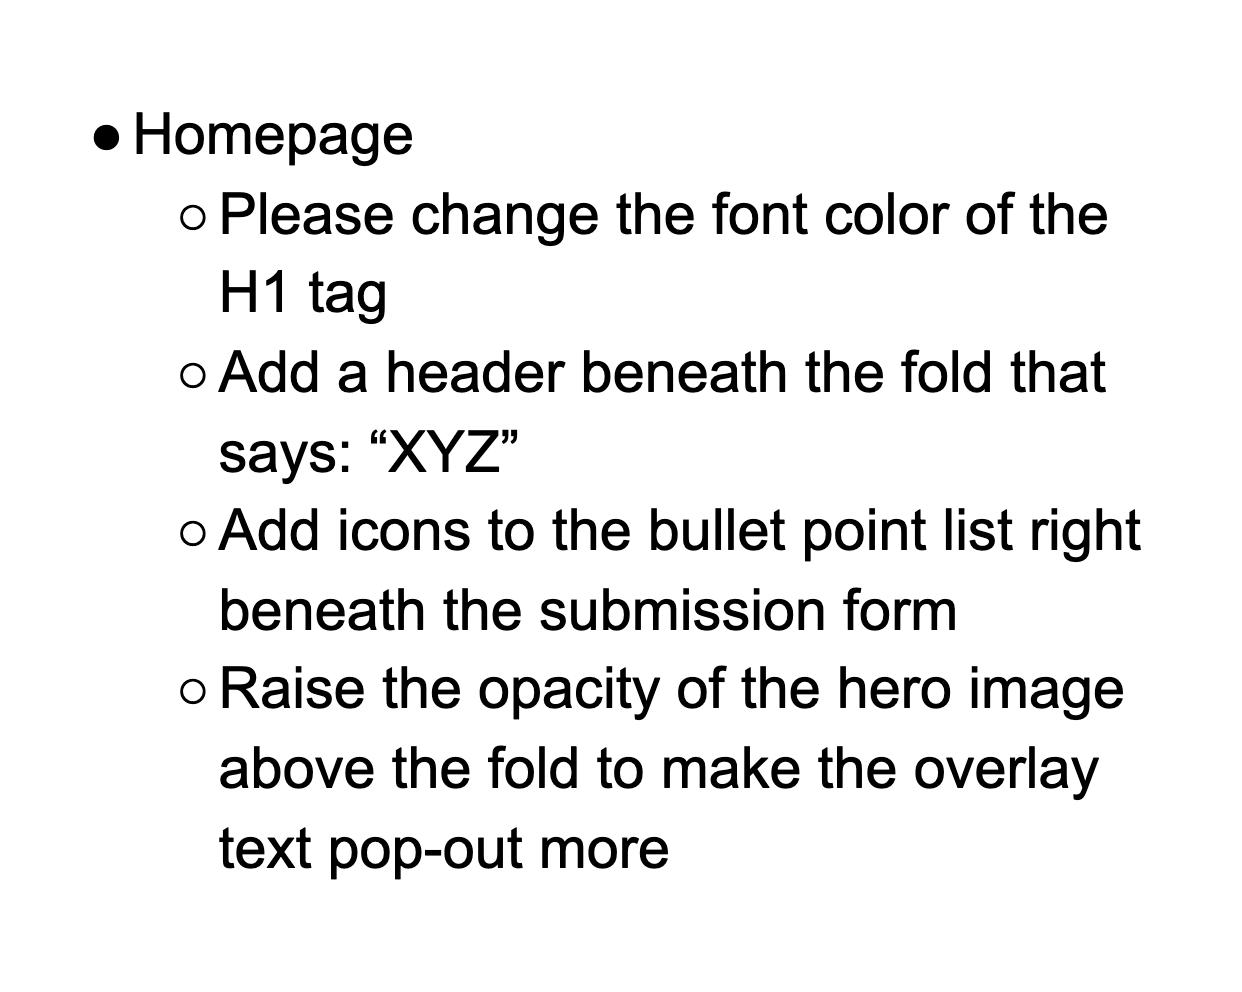 bullet point feedback